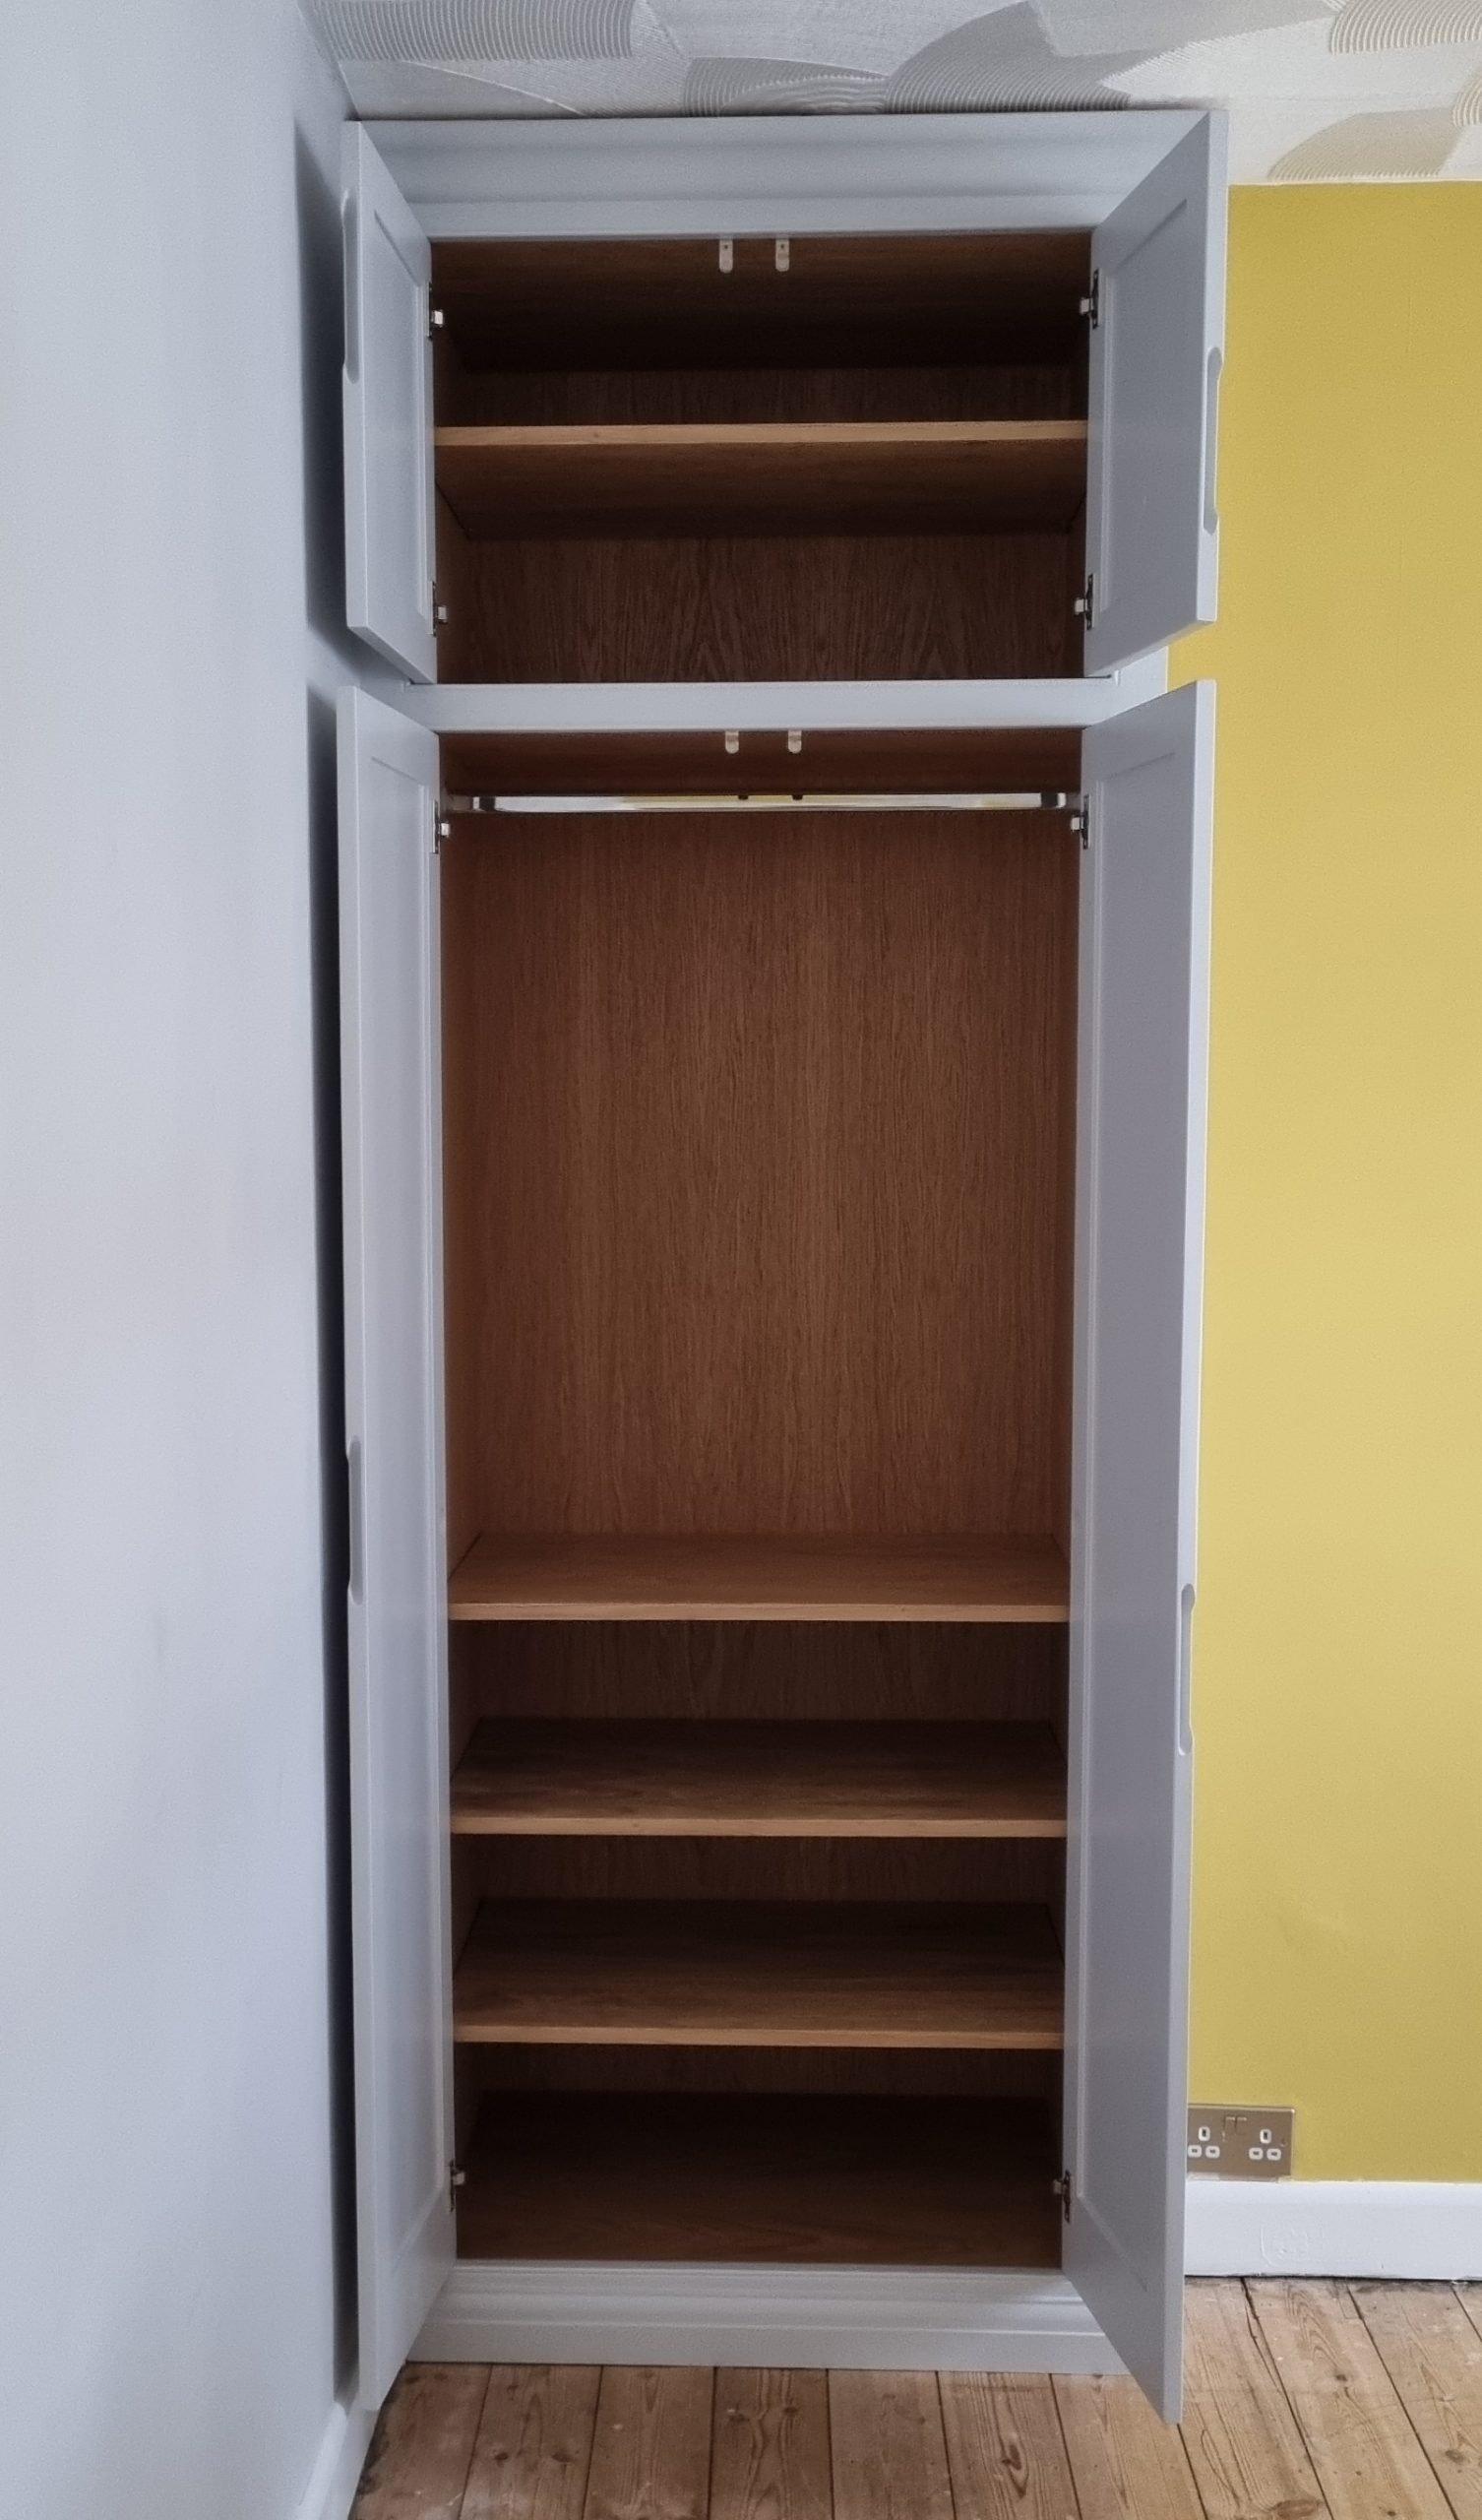 Furniture Maker Shaker Wardrobe 2